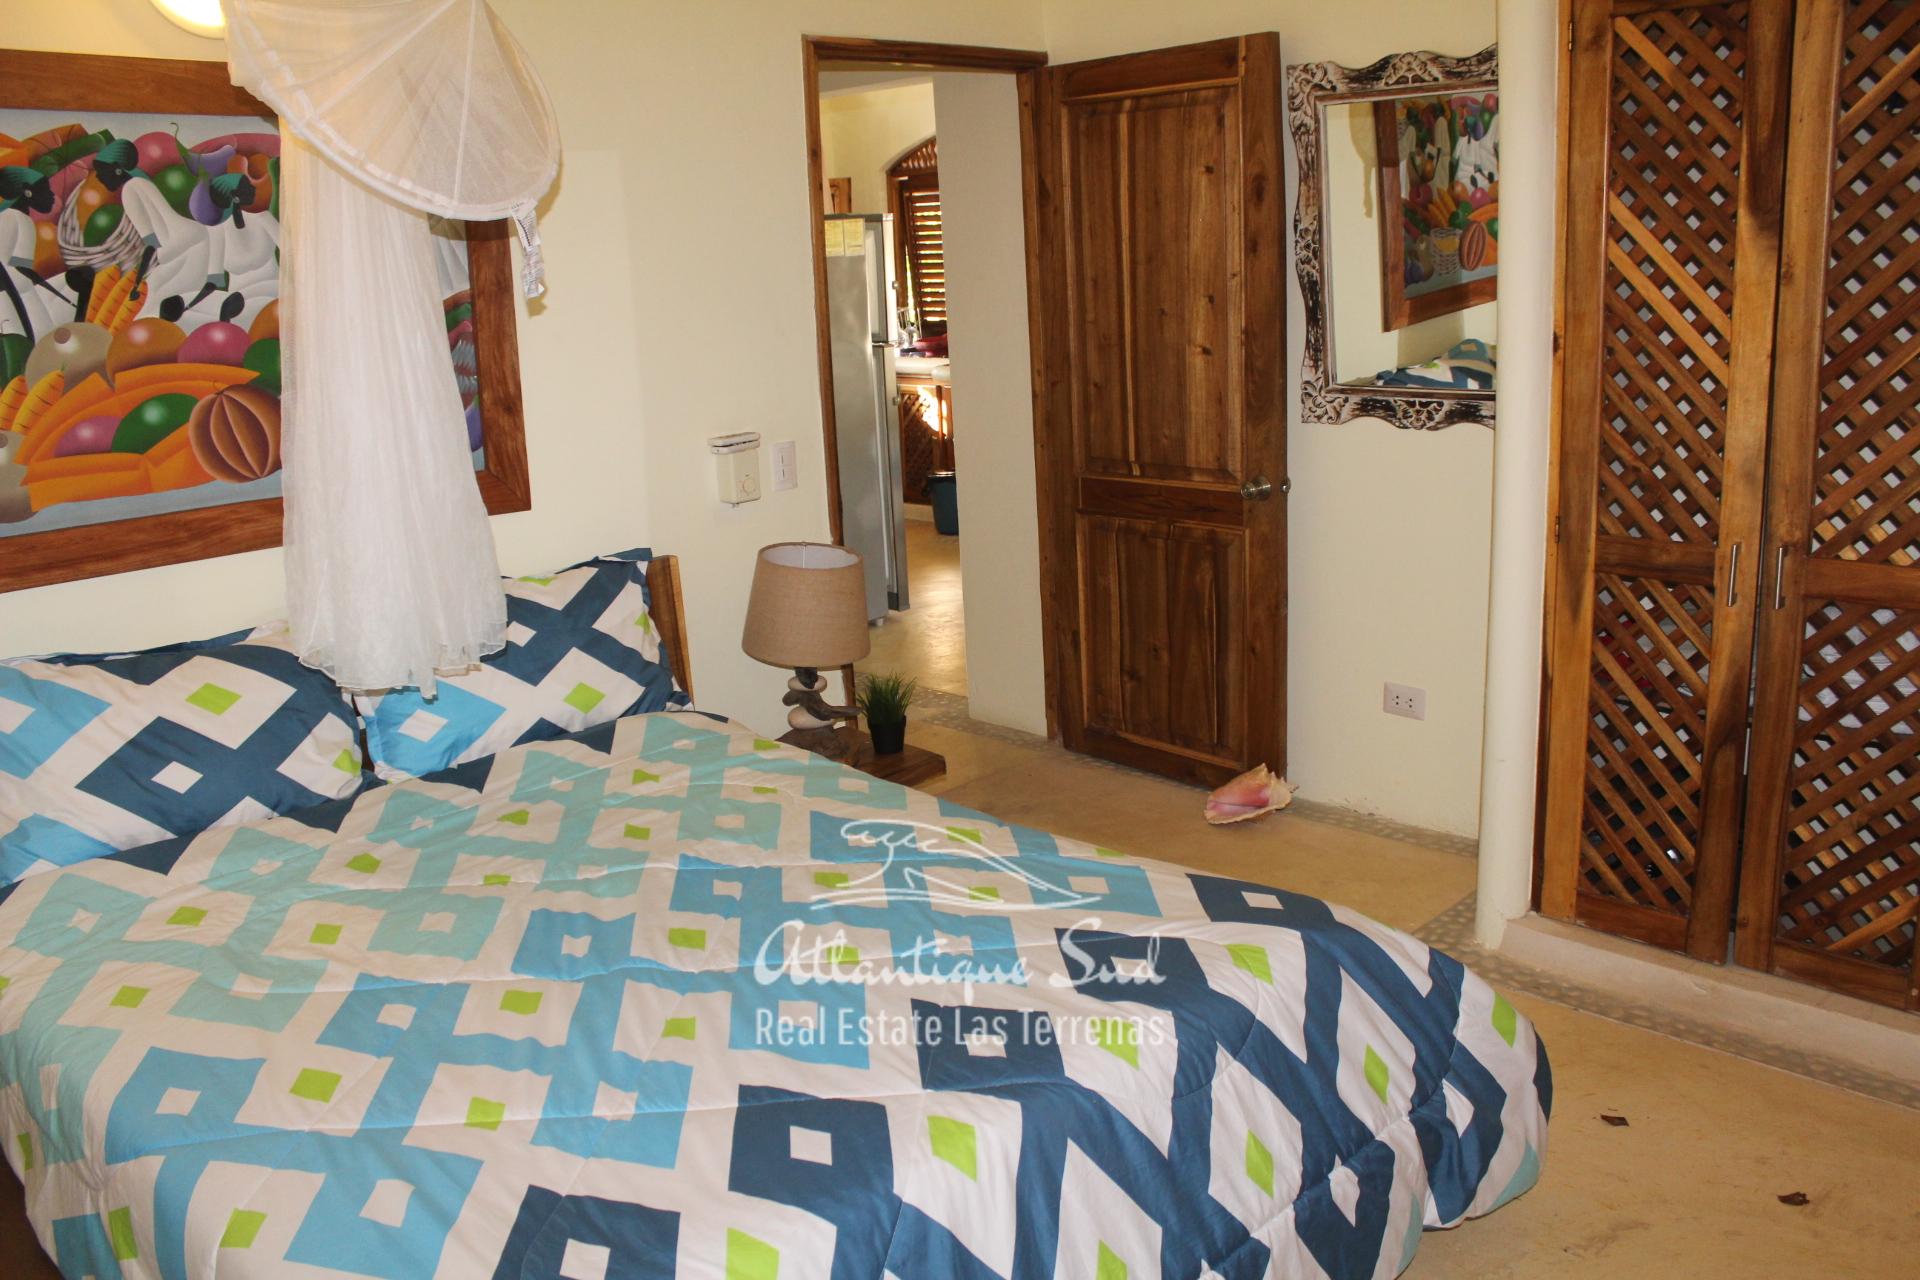 2 carribean villas minutes to the beach Real Estate Las Terrenas Dominican Republic Atlantique Sud17.jpg